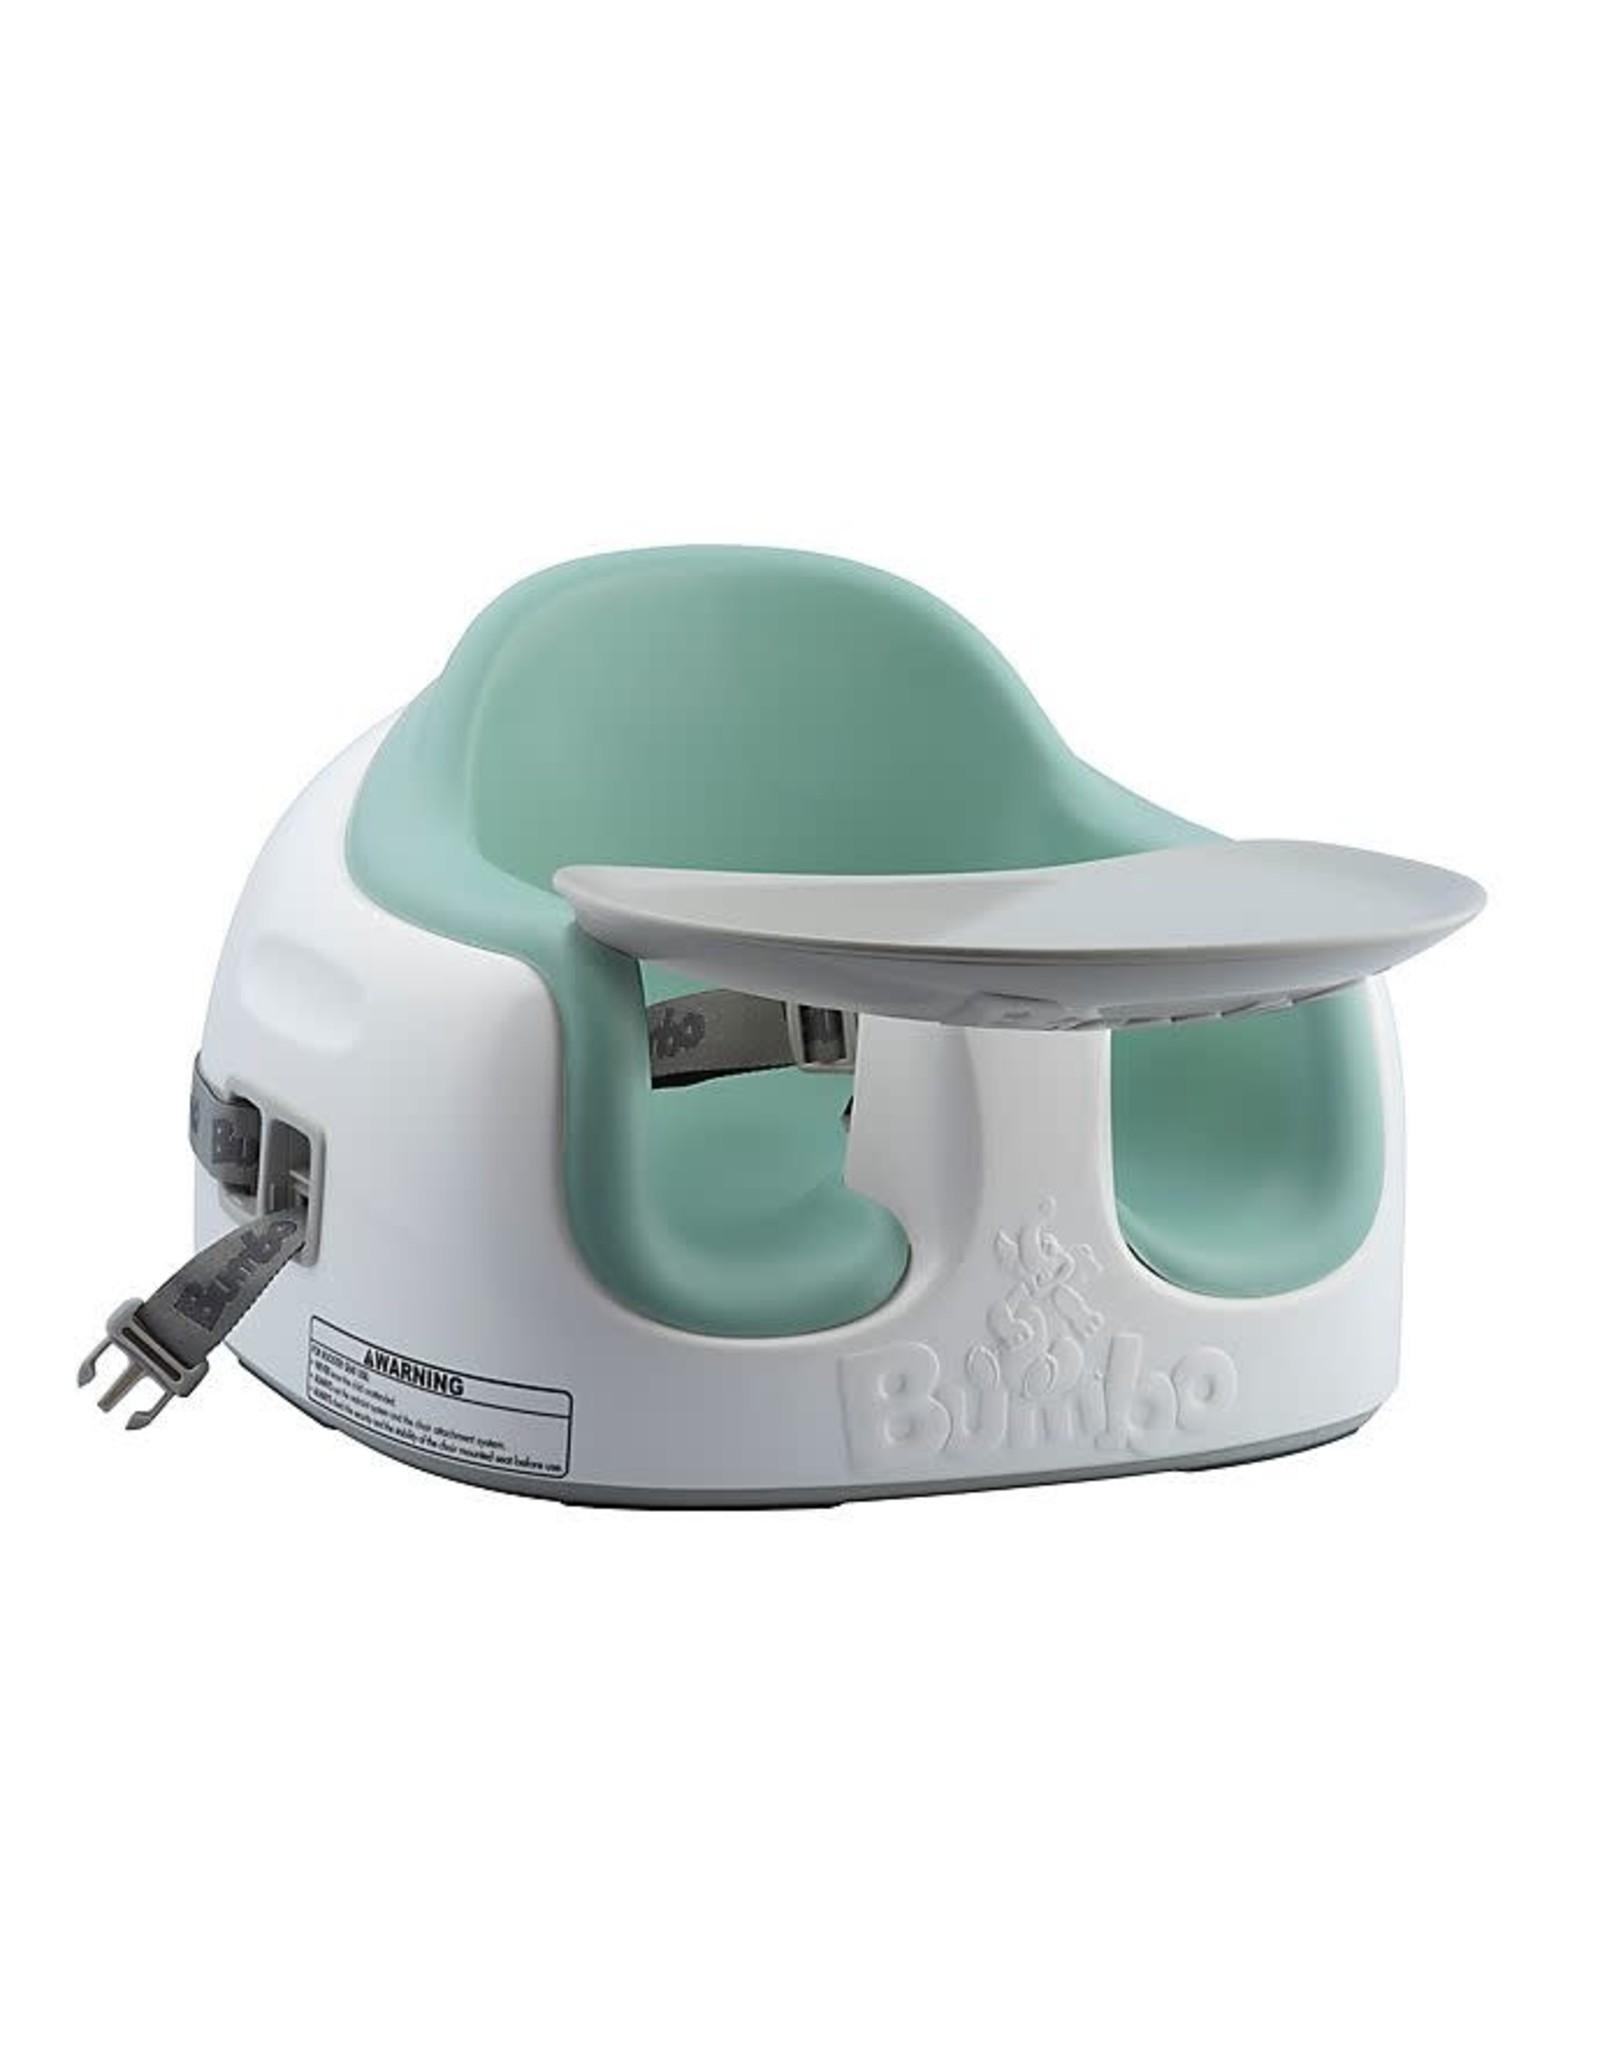 Bumbo Bumbo Multi-Purpose Seat, Hemlock